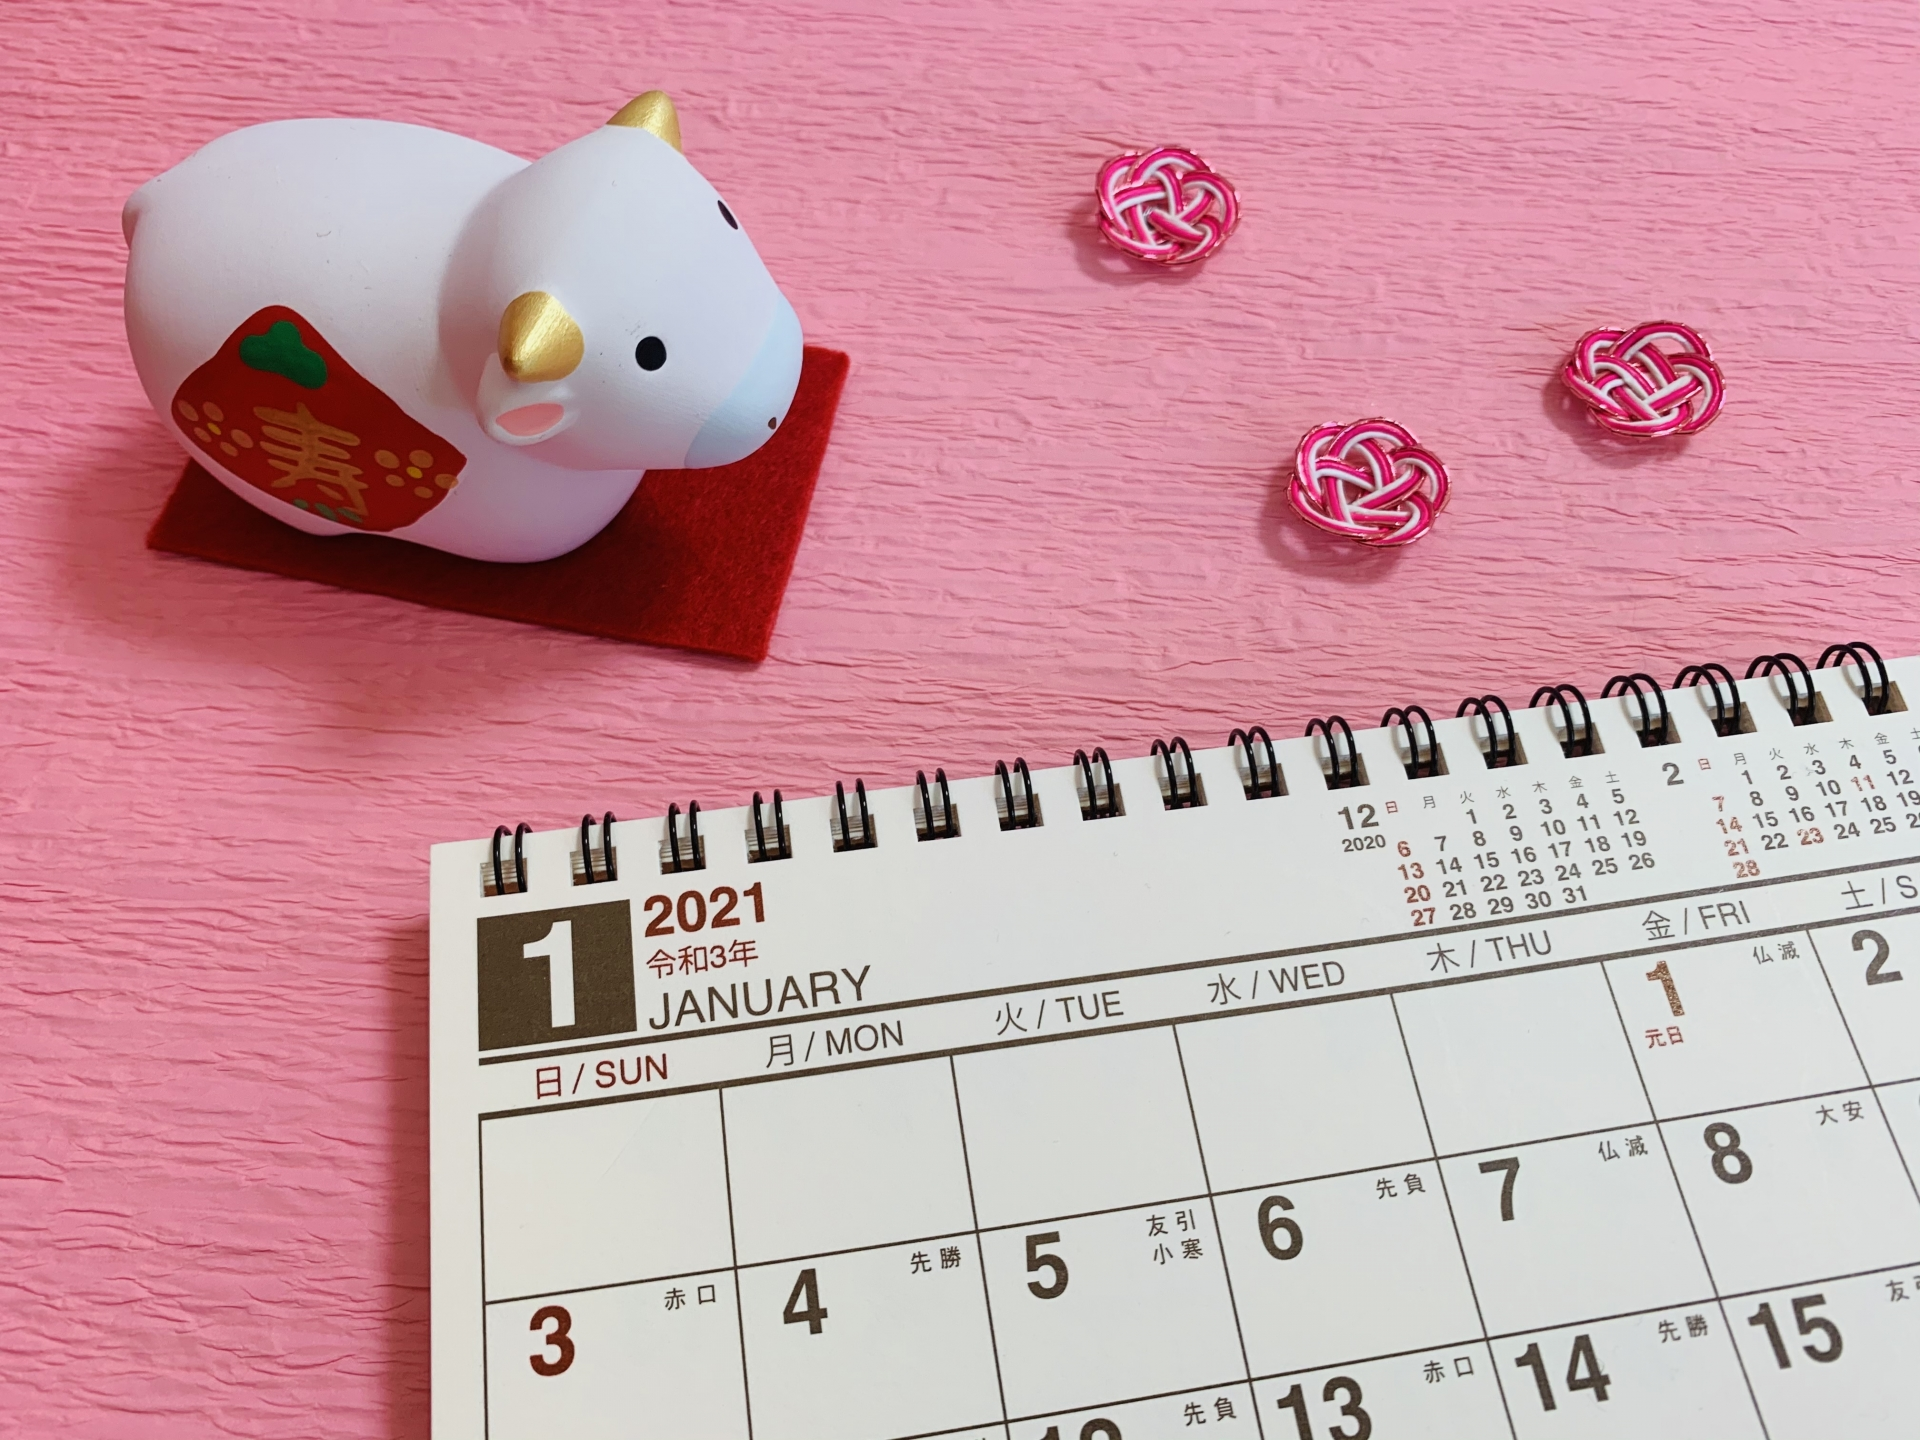 Japan's National Holidays 2021